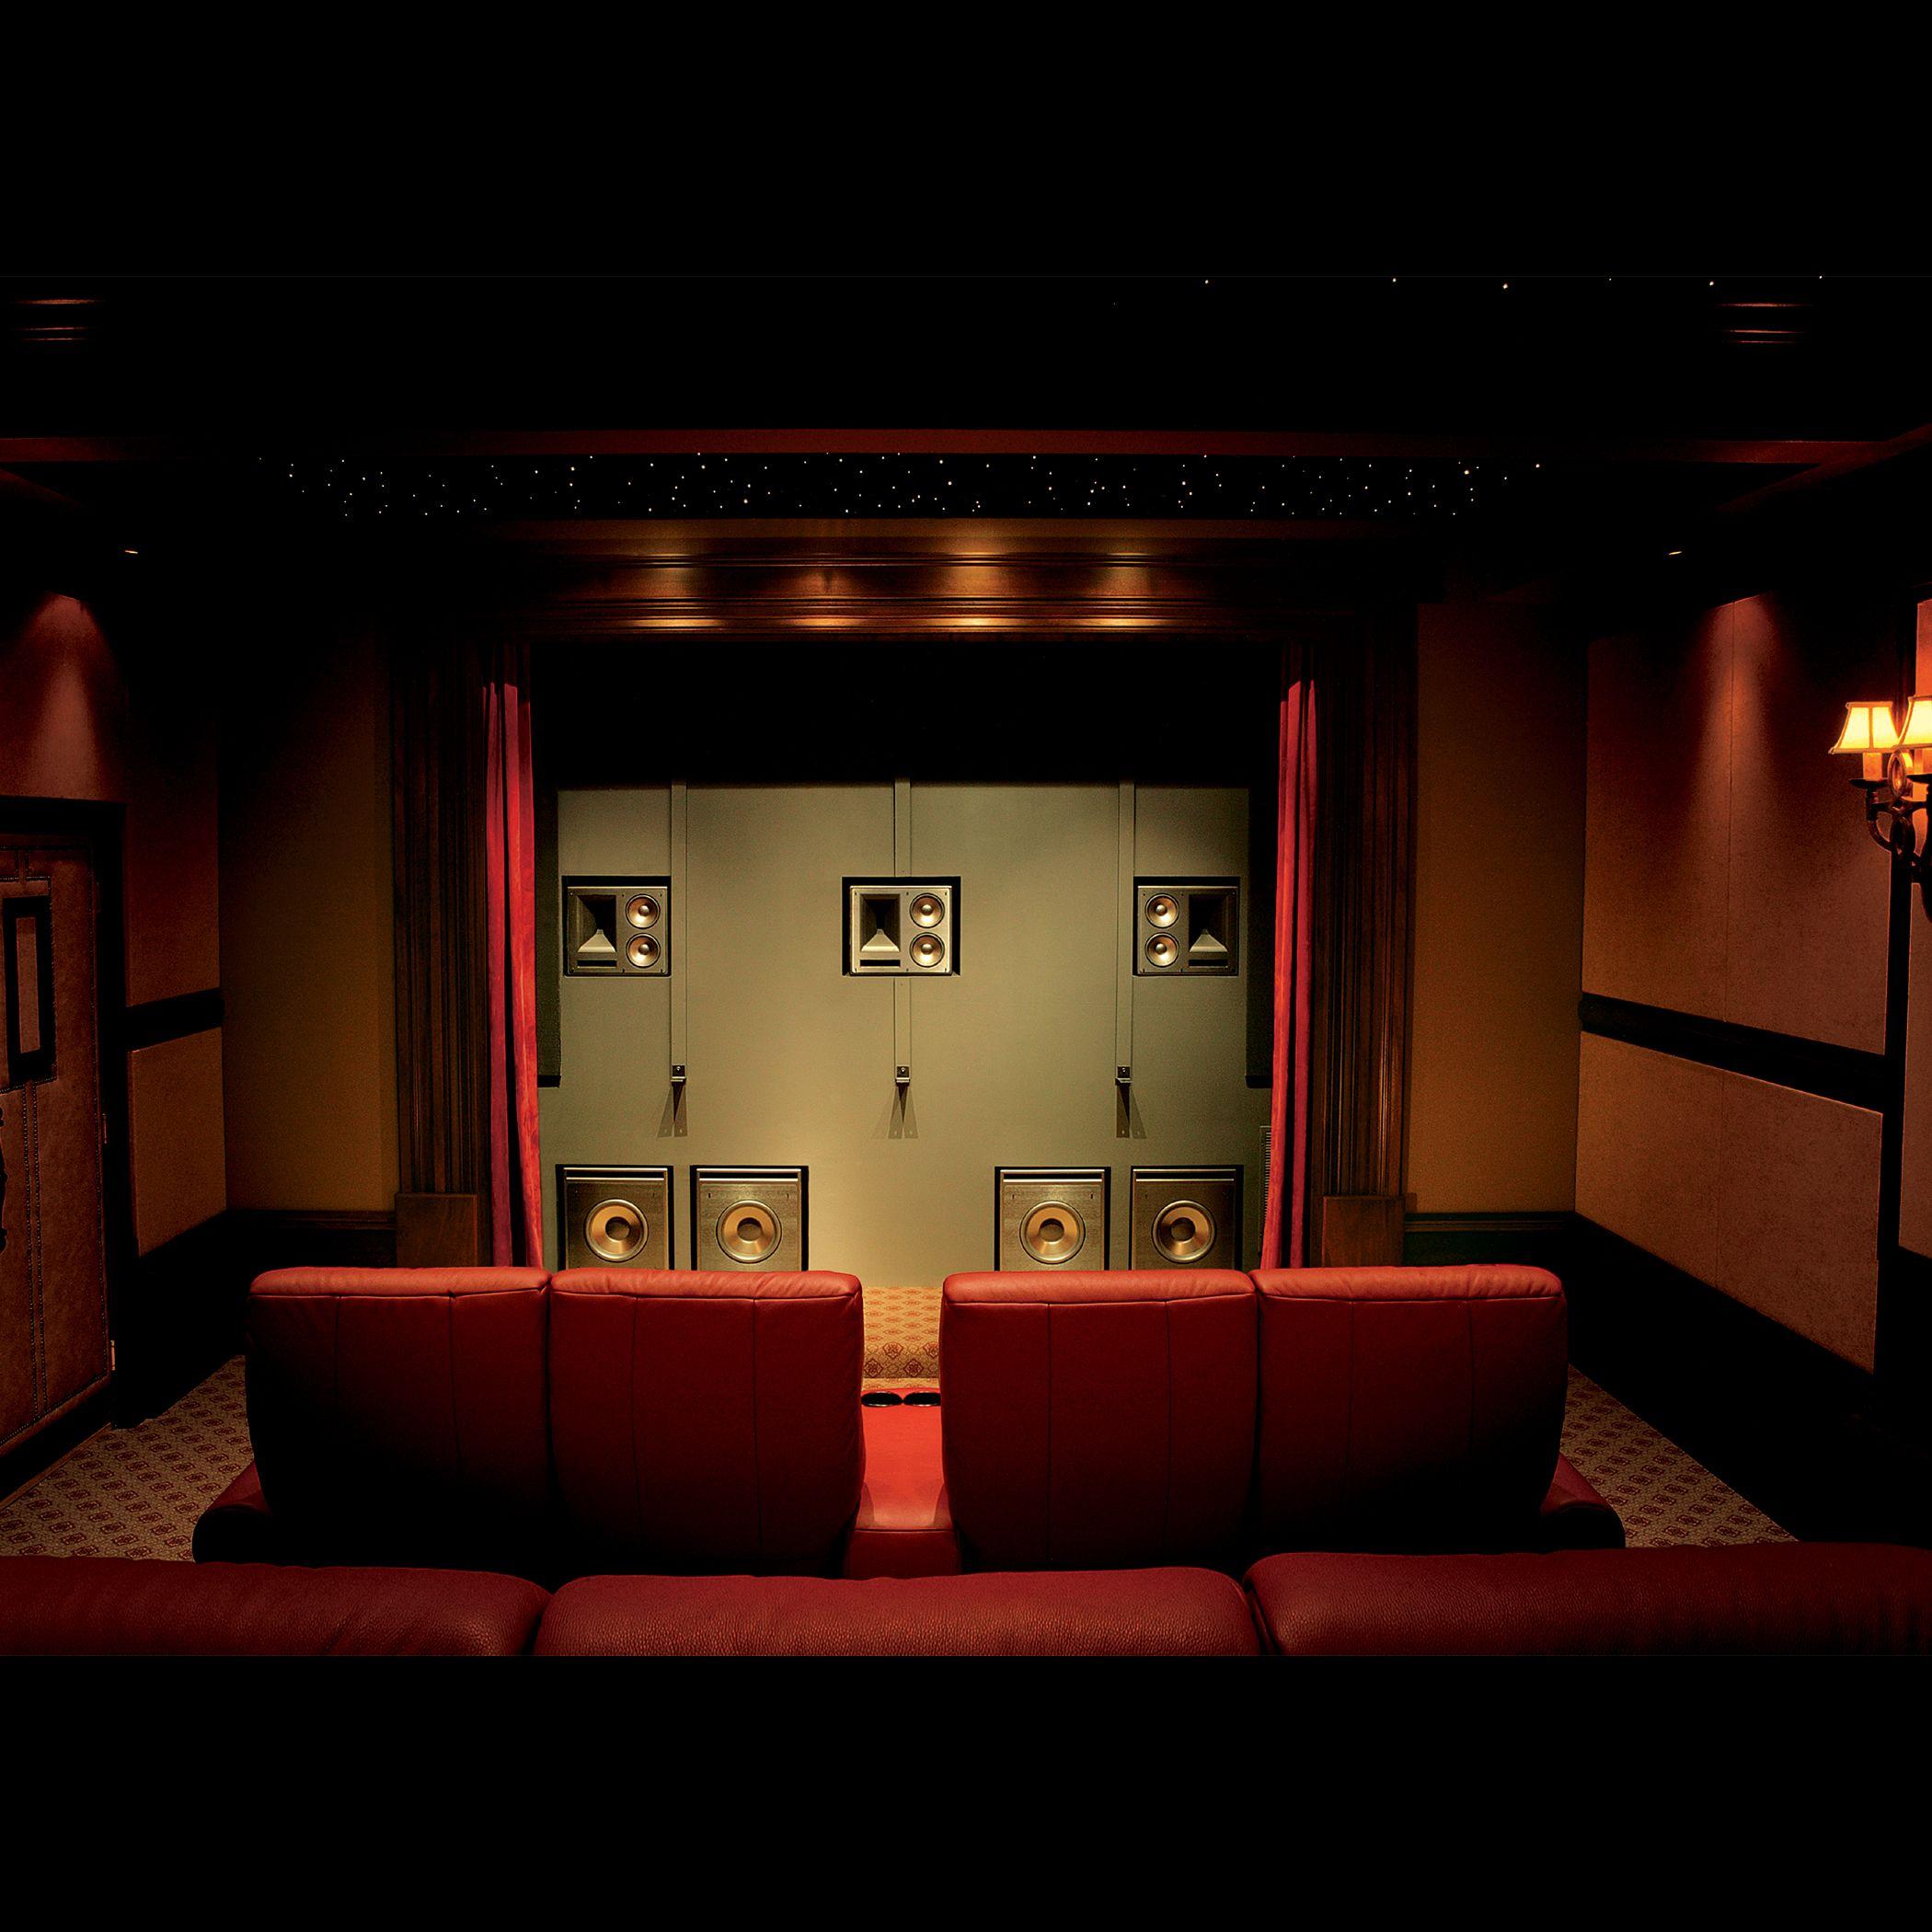 Custom Home Theater Rooms: The Award-winning Klipsch THX Ultra2 Custom Home Theater